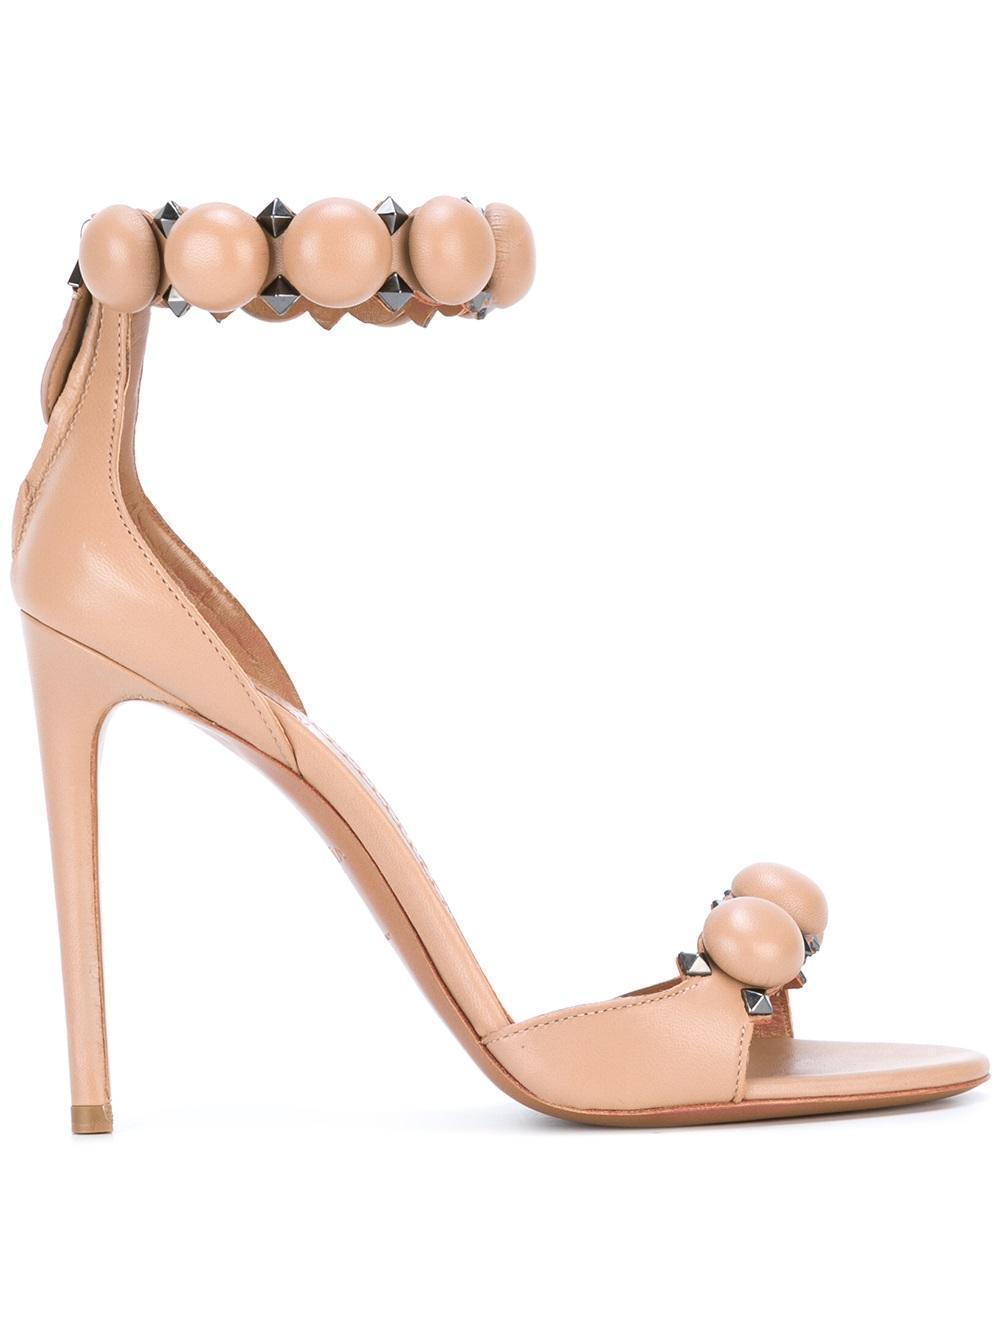 Alaïa Bombe 110 Studded Leather Sandals